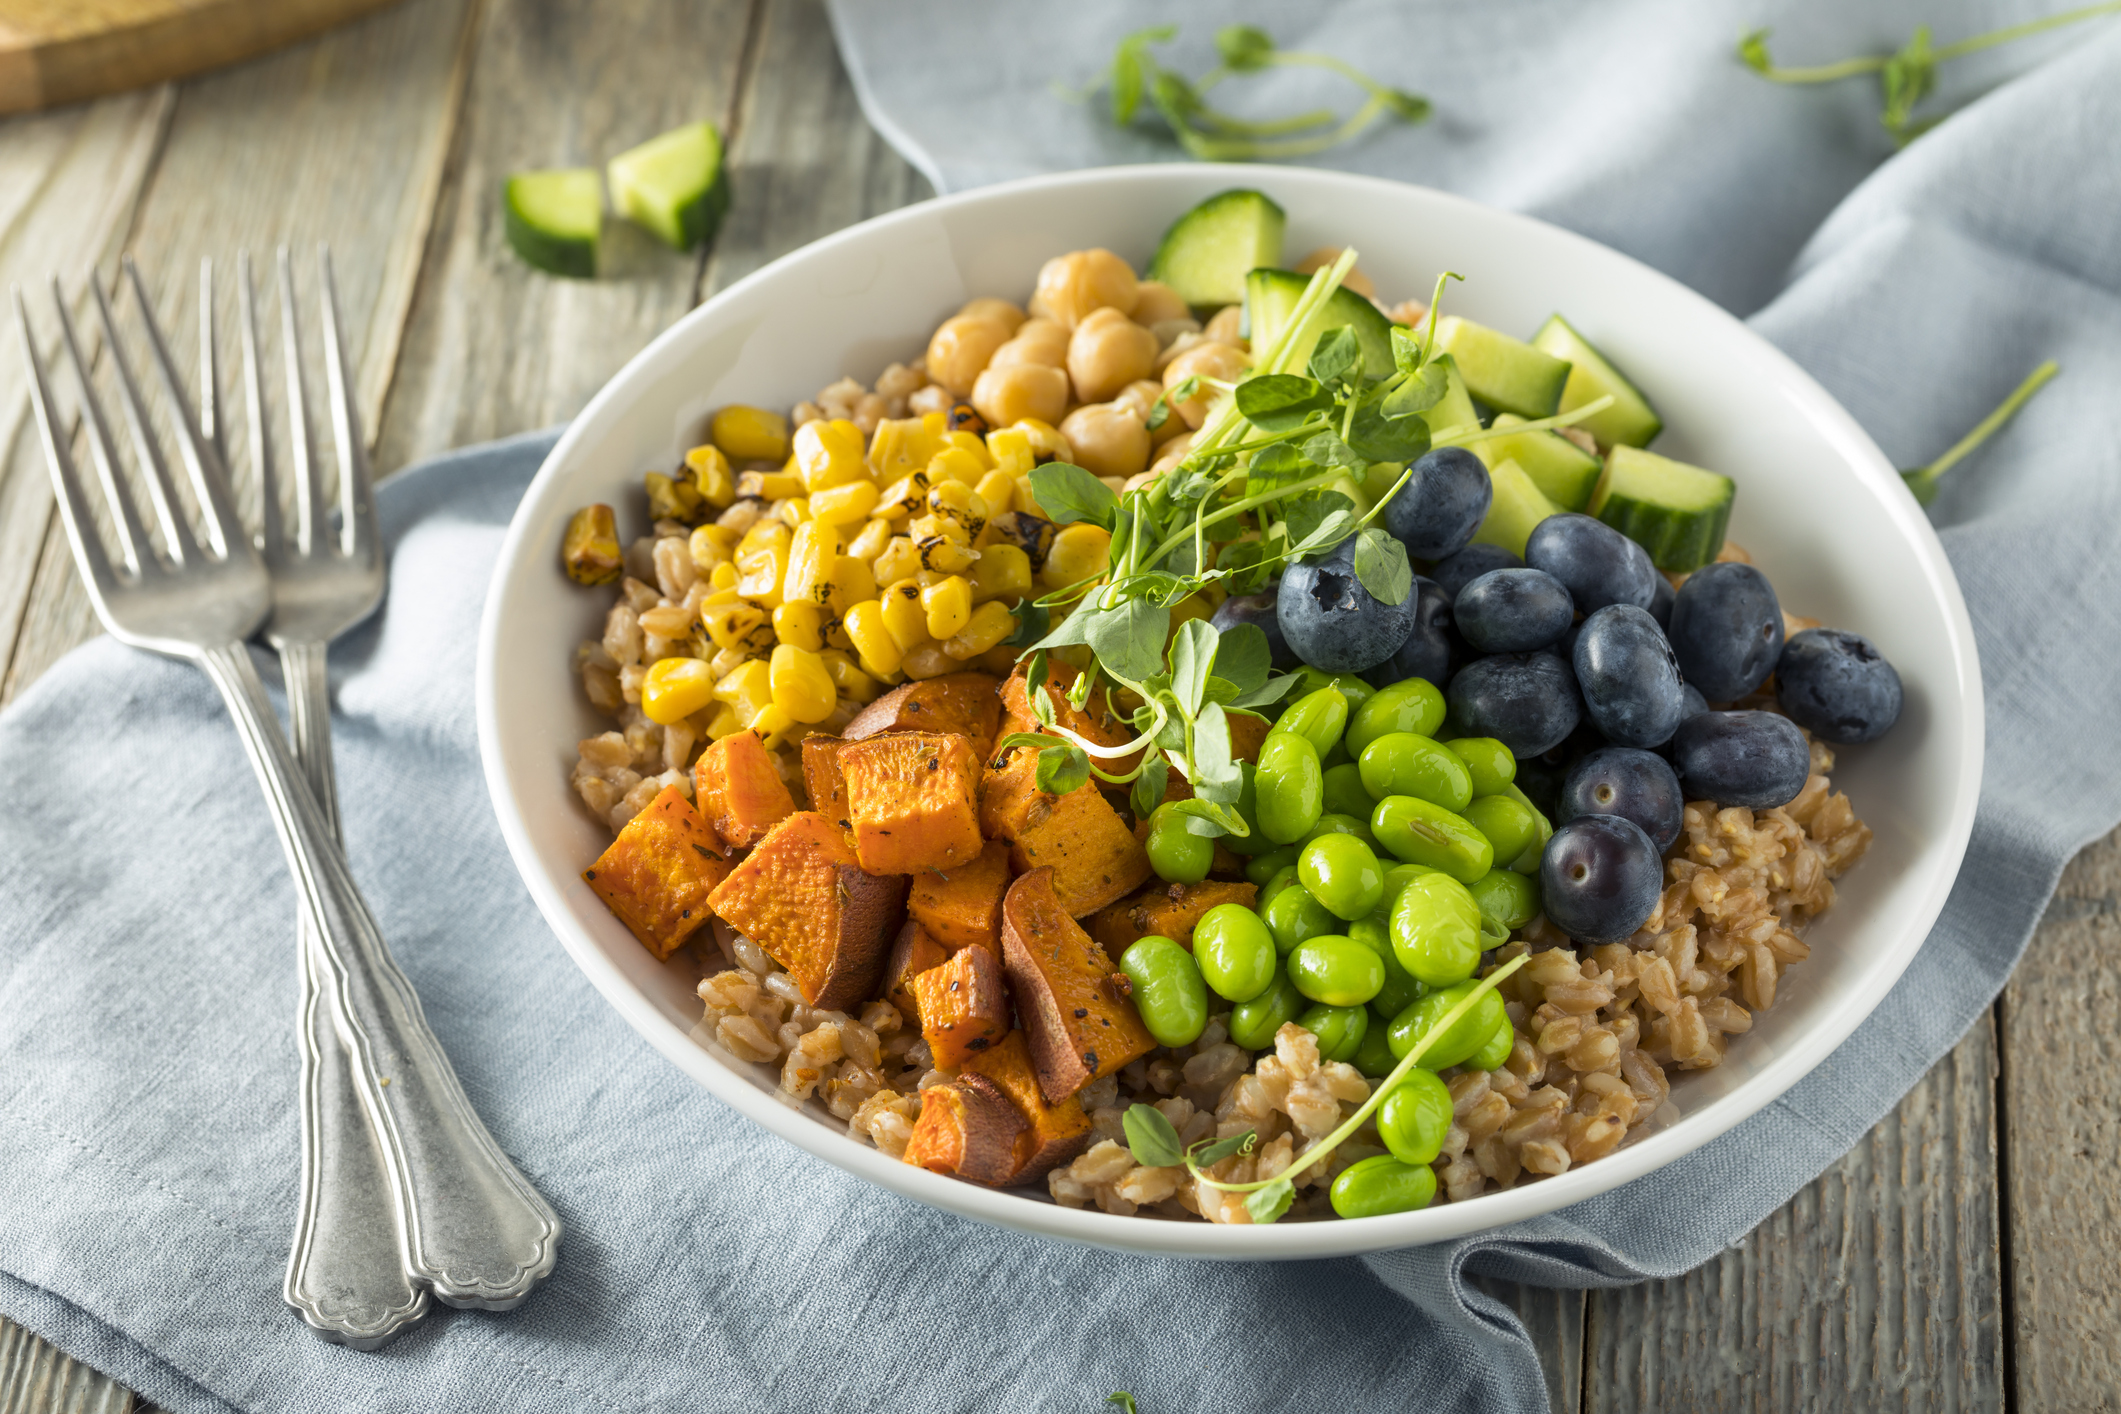 6 Easy Meatless Meals Under 400 Calories Q4fit Com